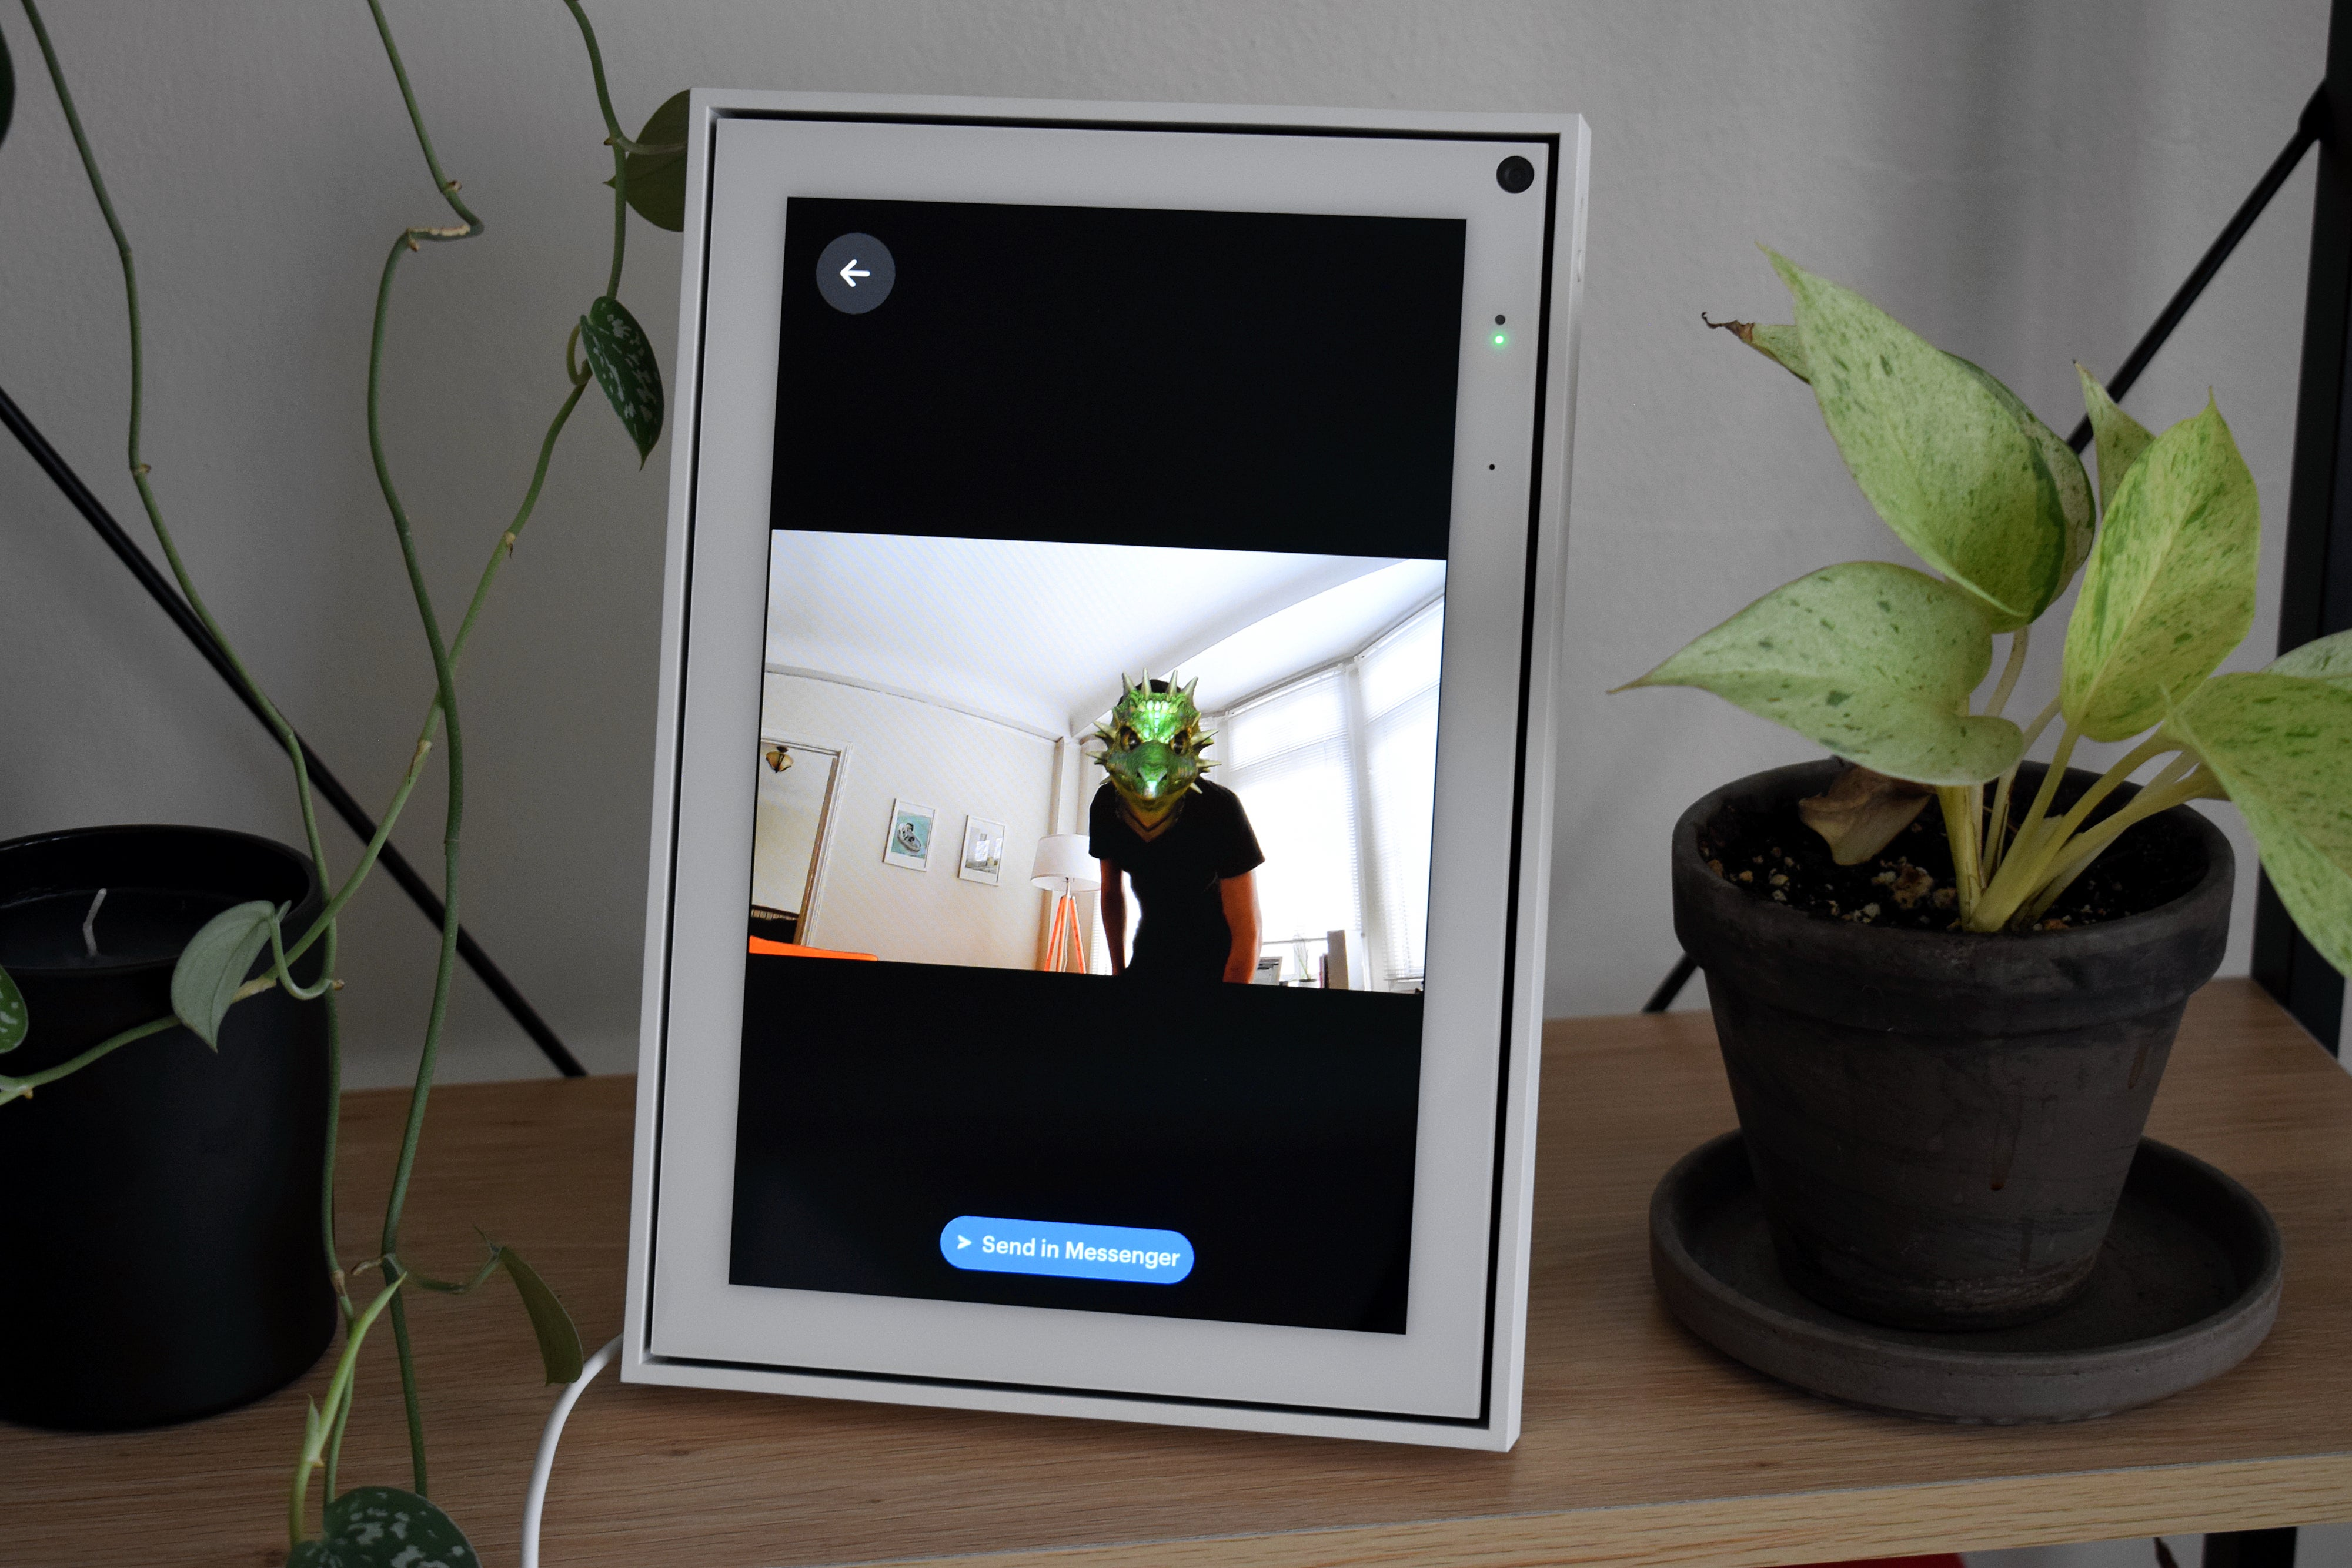 Facebook Portal video chat